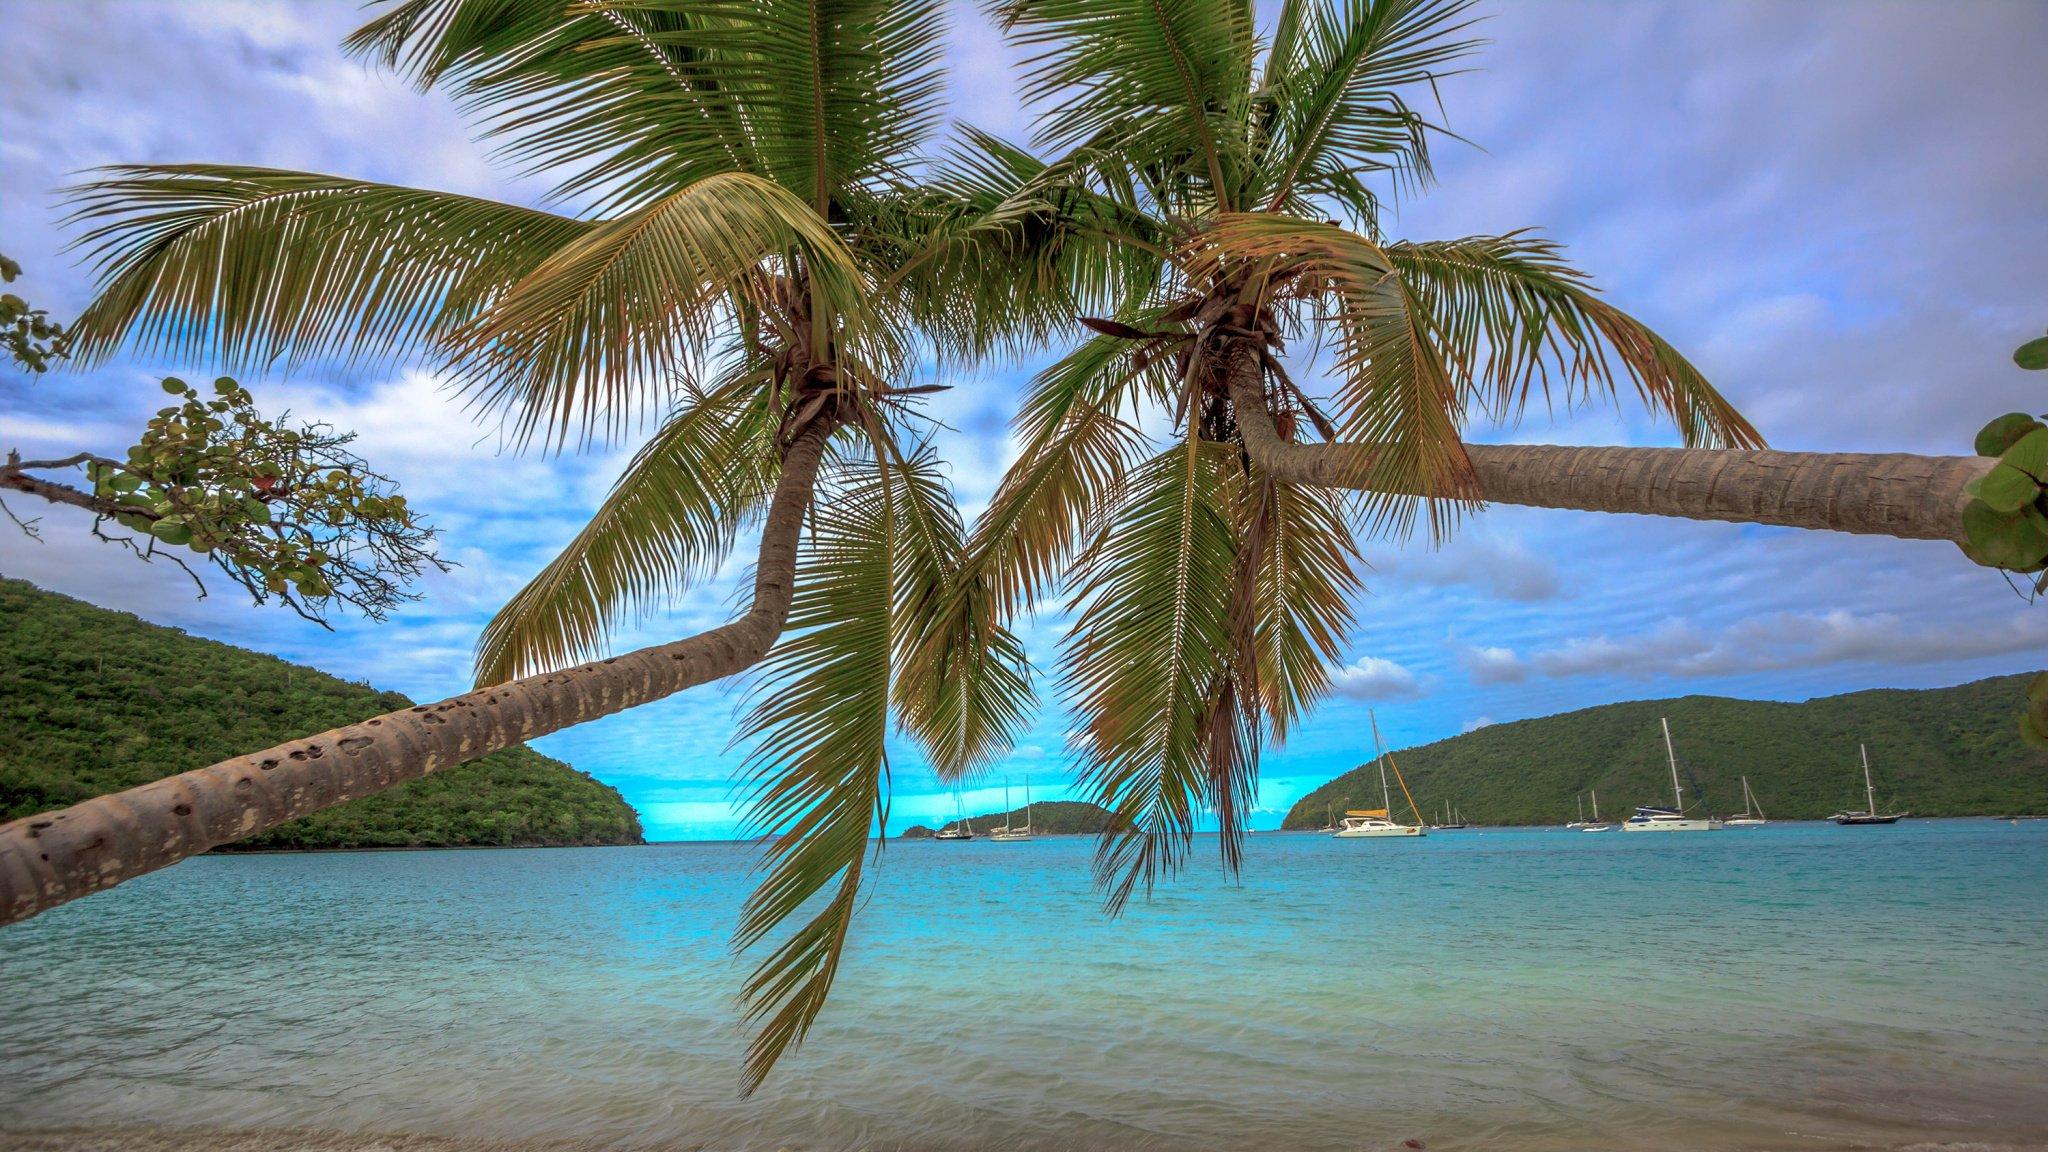 Palm Tree Screensaver HD Desktop Wallpaper